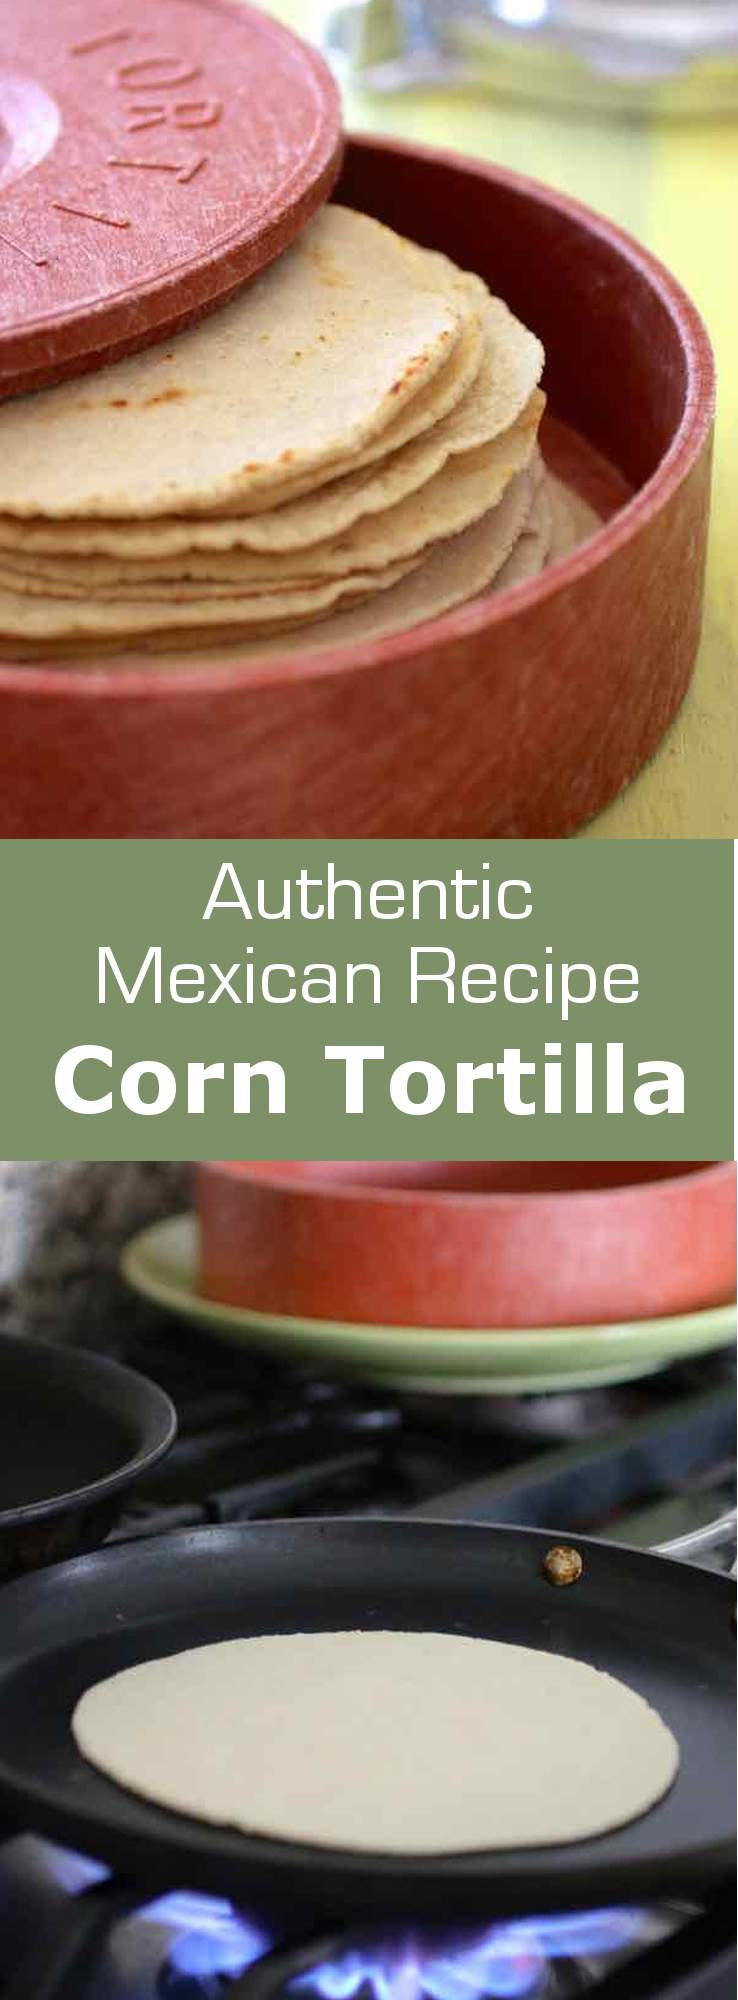 ... make tacos, enchiladas or be fried to make corn tortilla chips. #